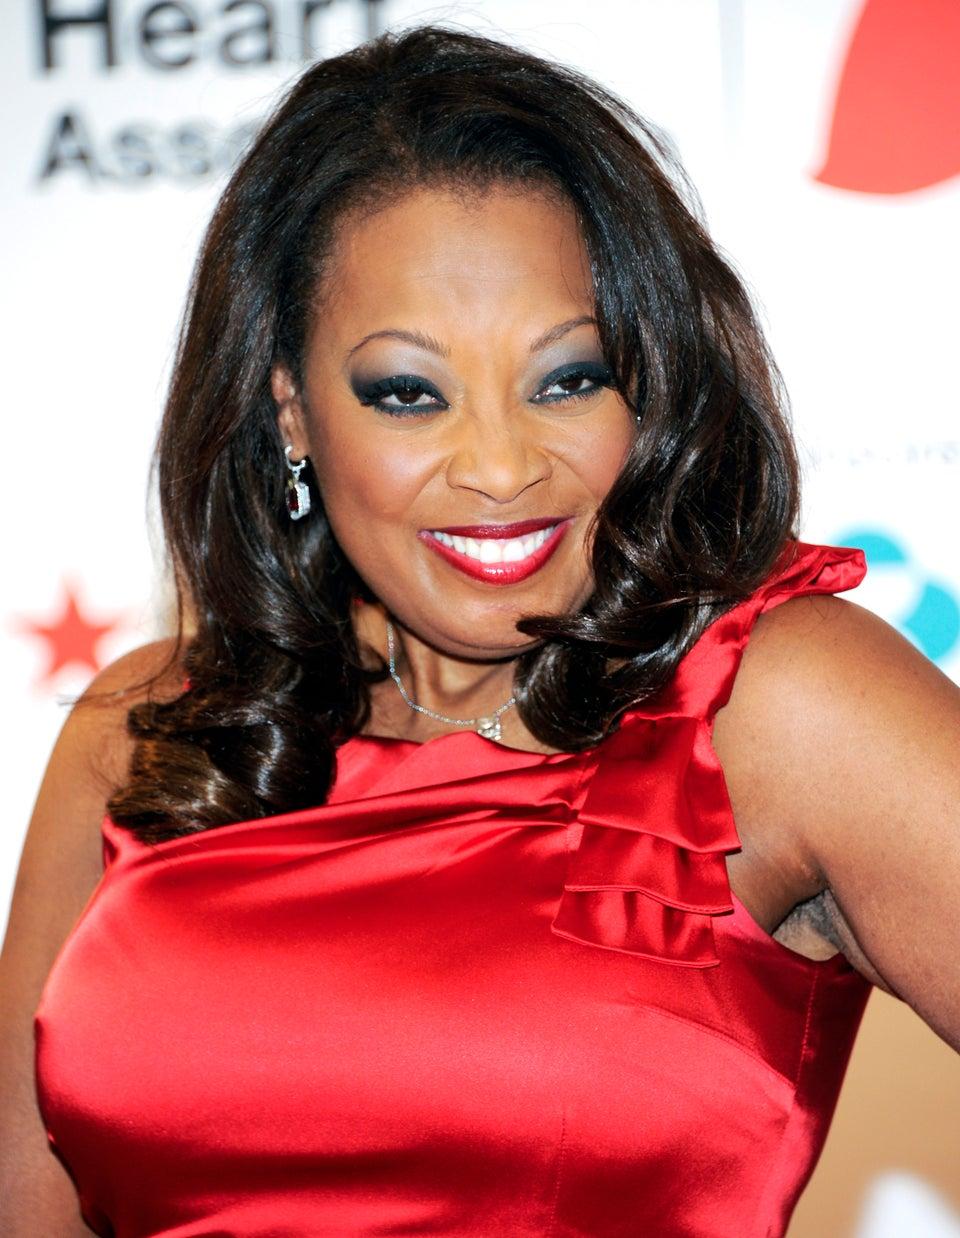 Star Jones on 'Basketball Wives' Drama: 'Enough is Enough'